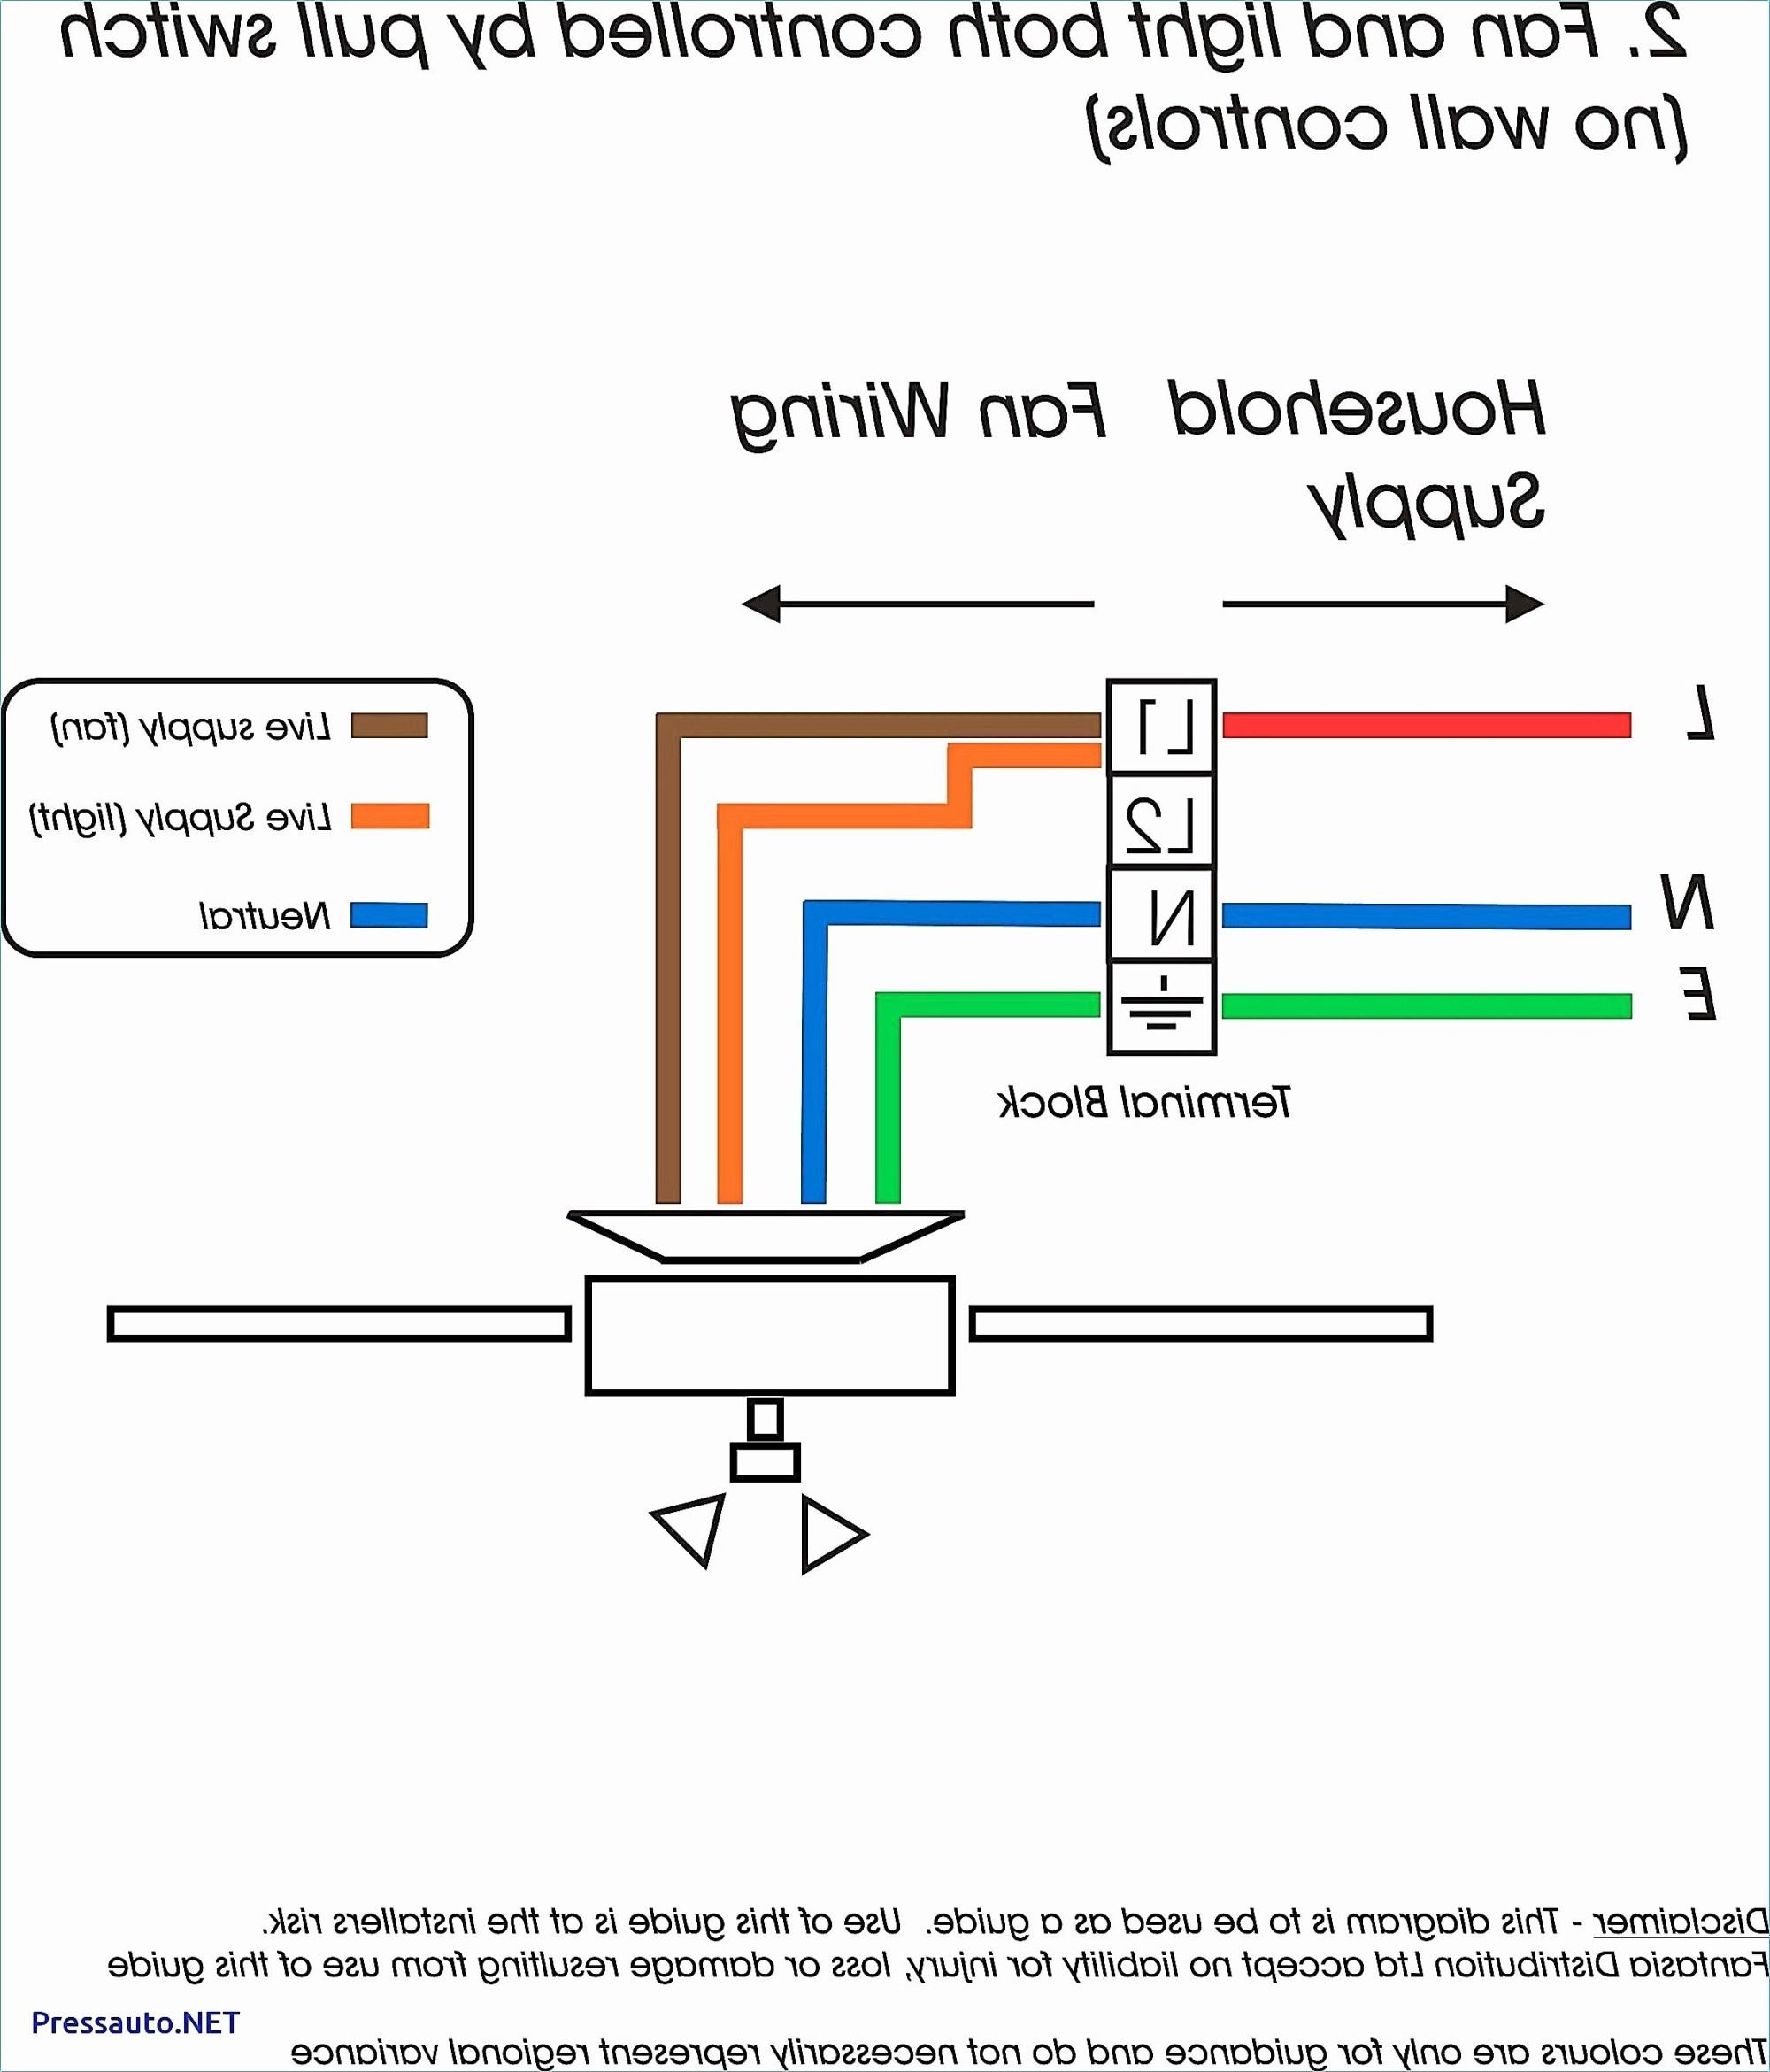 hight resolution of speaker wiring diagram rate wiring diagram for theater speakers valid wiring diagram home speaker wiring diagram elegant 2001 oldsmobile alero